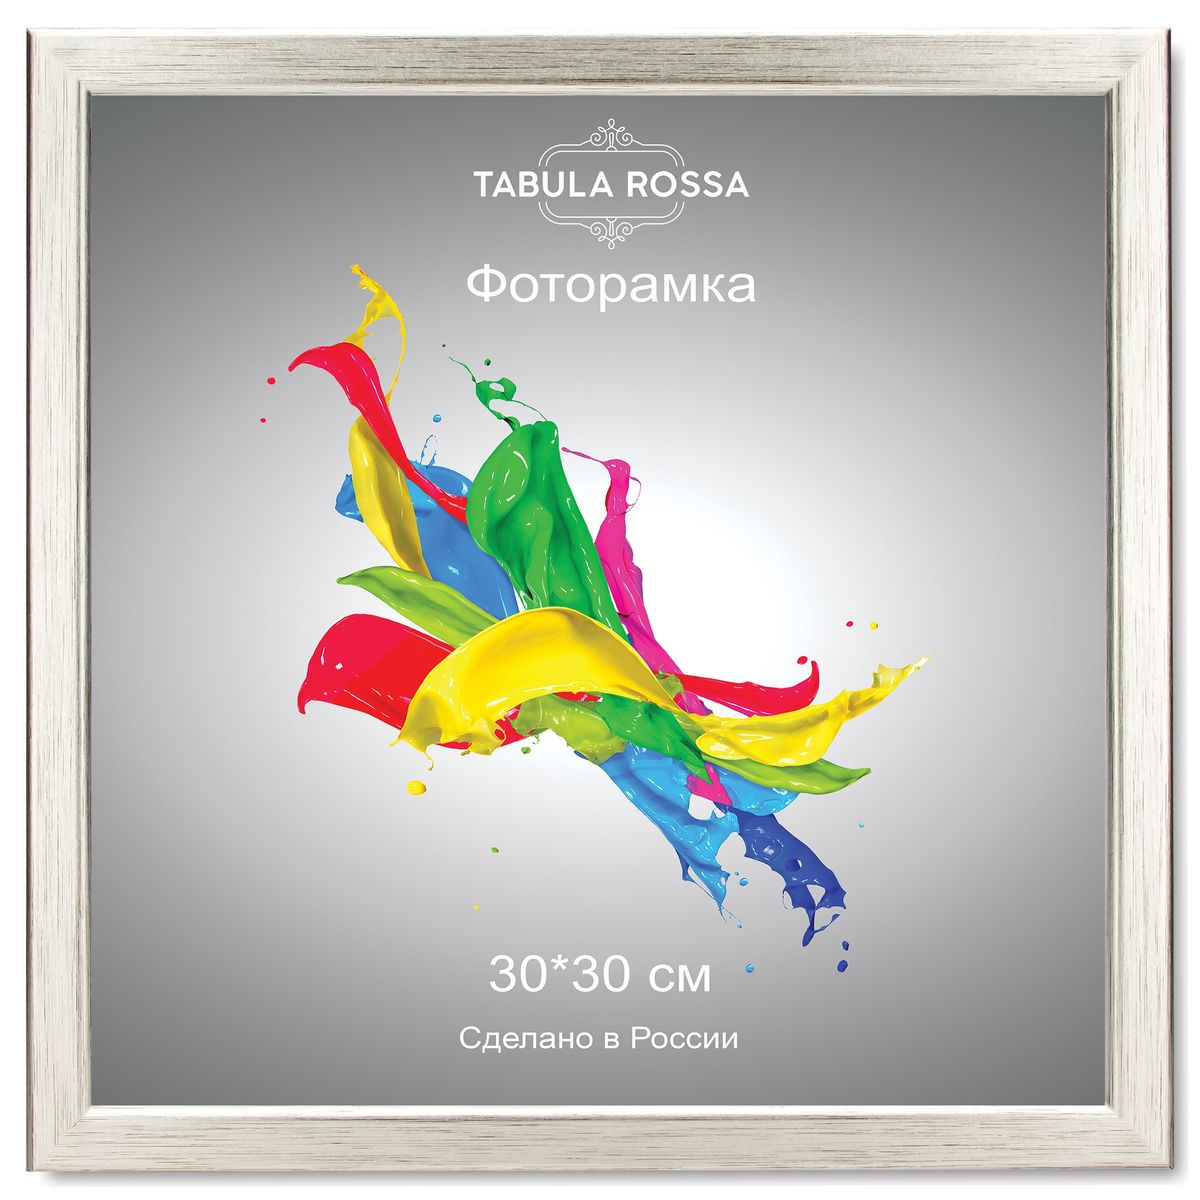 Фоторамка Tabula Rossa, цвет: серебро, 30 х 30 см. ТР 5134 фоторамки tabula rossa фоторамка 13х18 455